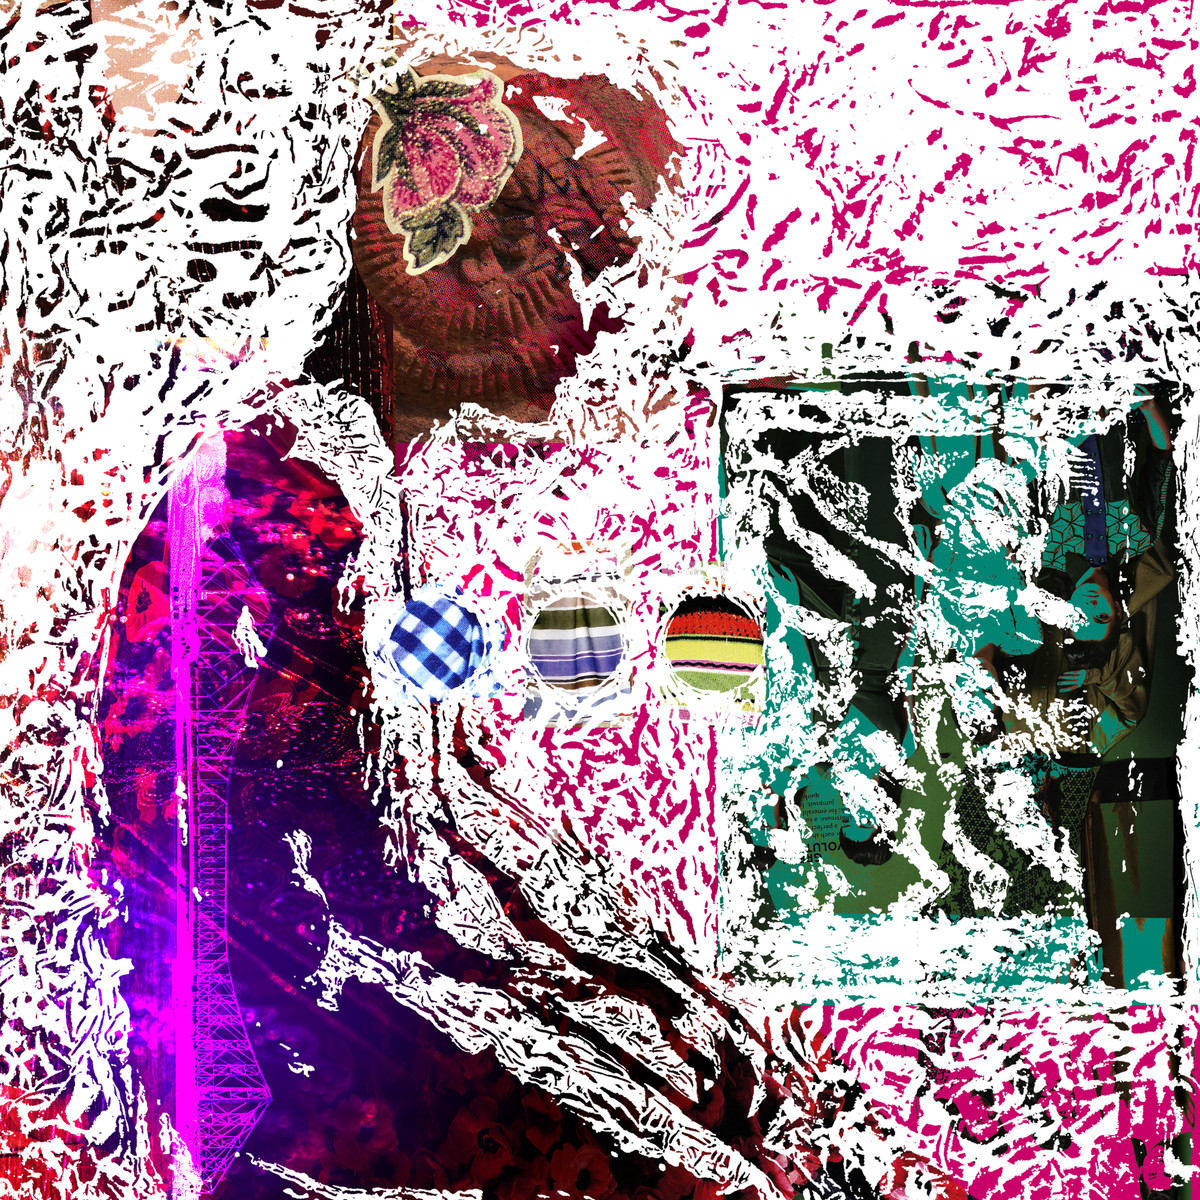 Narcissus by Sayak Mitra, Digital Digital Art, Digital Print on Archival Paper, Pink color